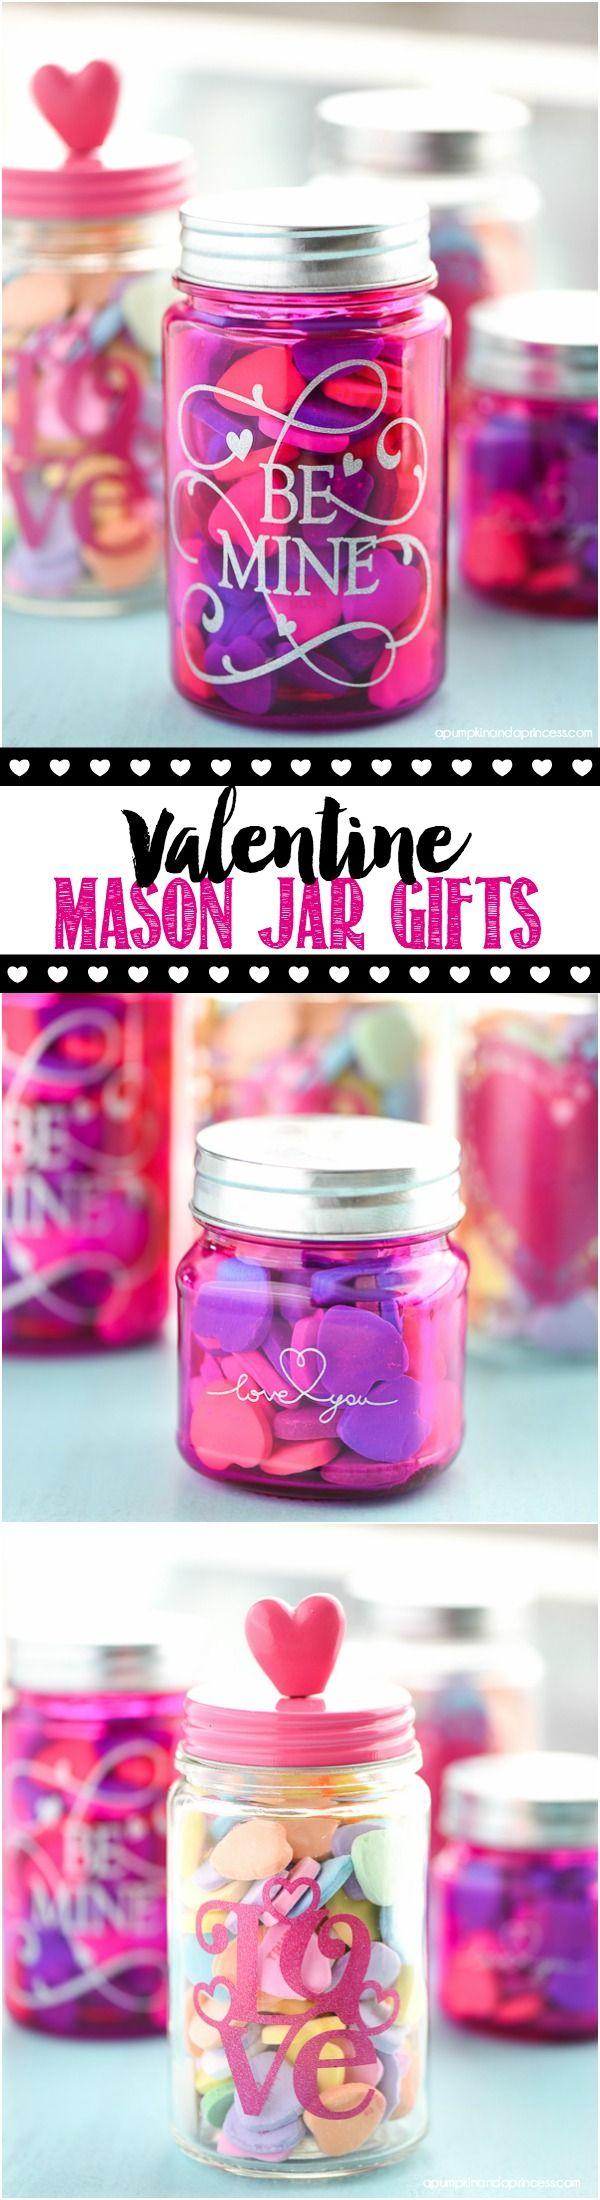 DIY Valentine's Day Mason Jar Gifts